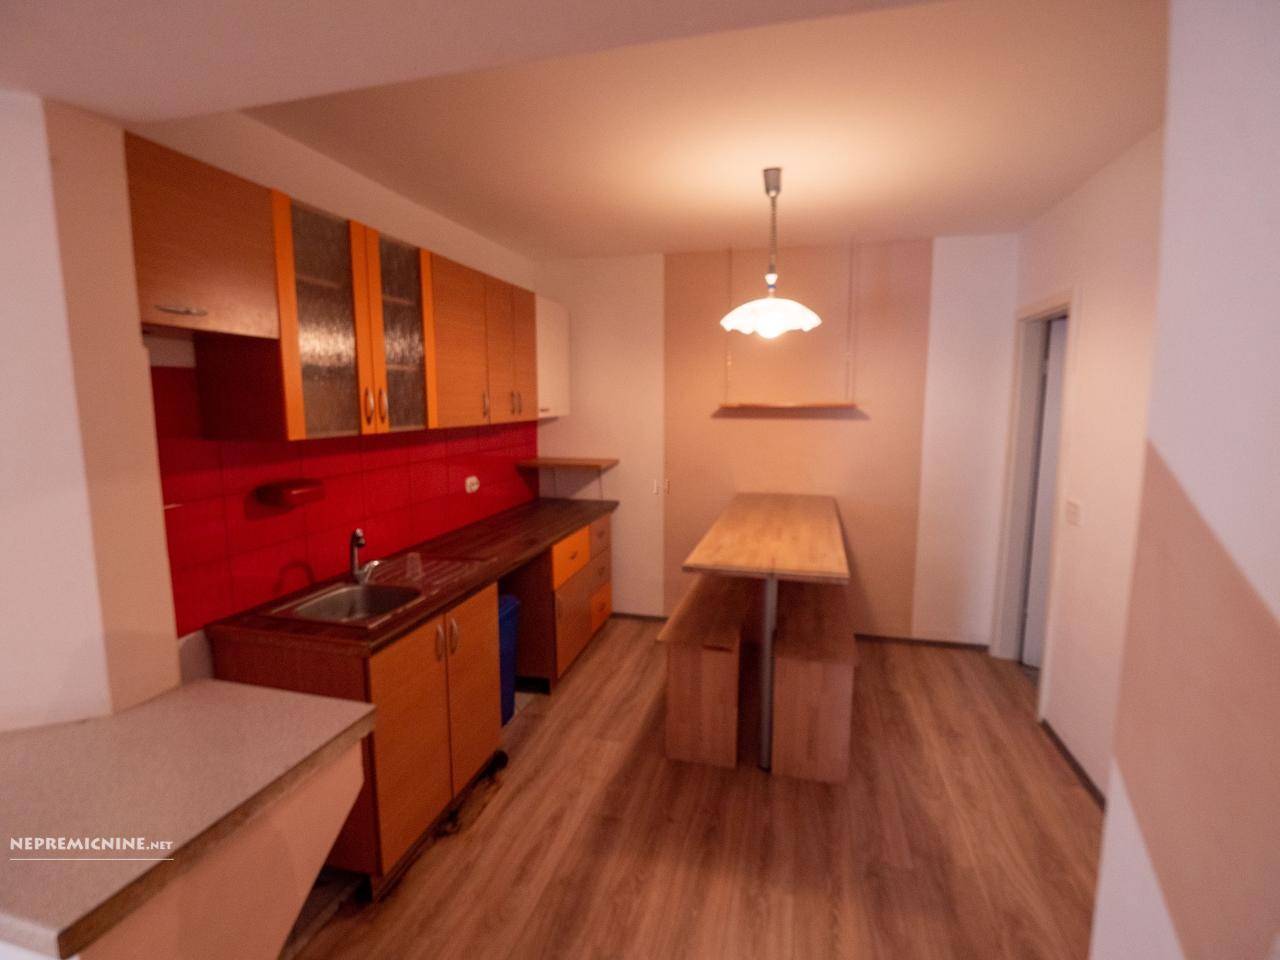 Prodaja, stanovanje - KAMNIK POD KRIMOM 1